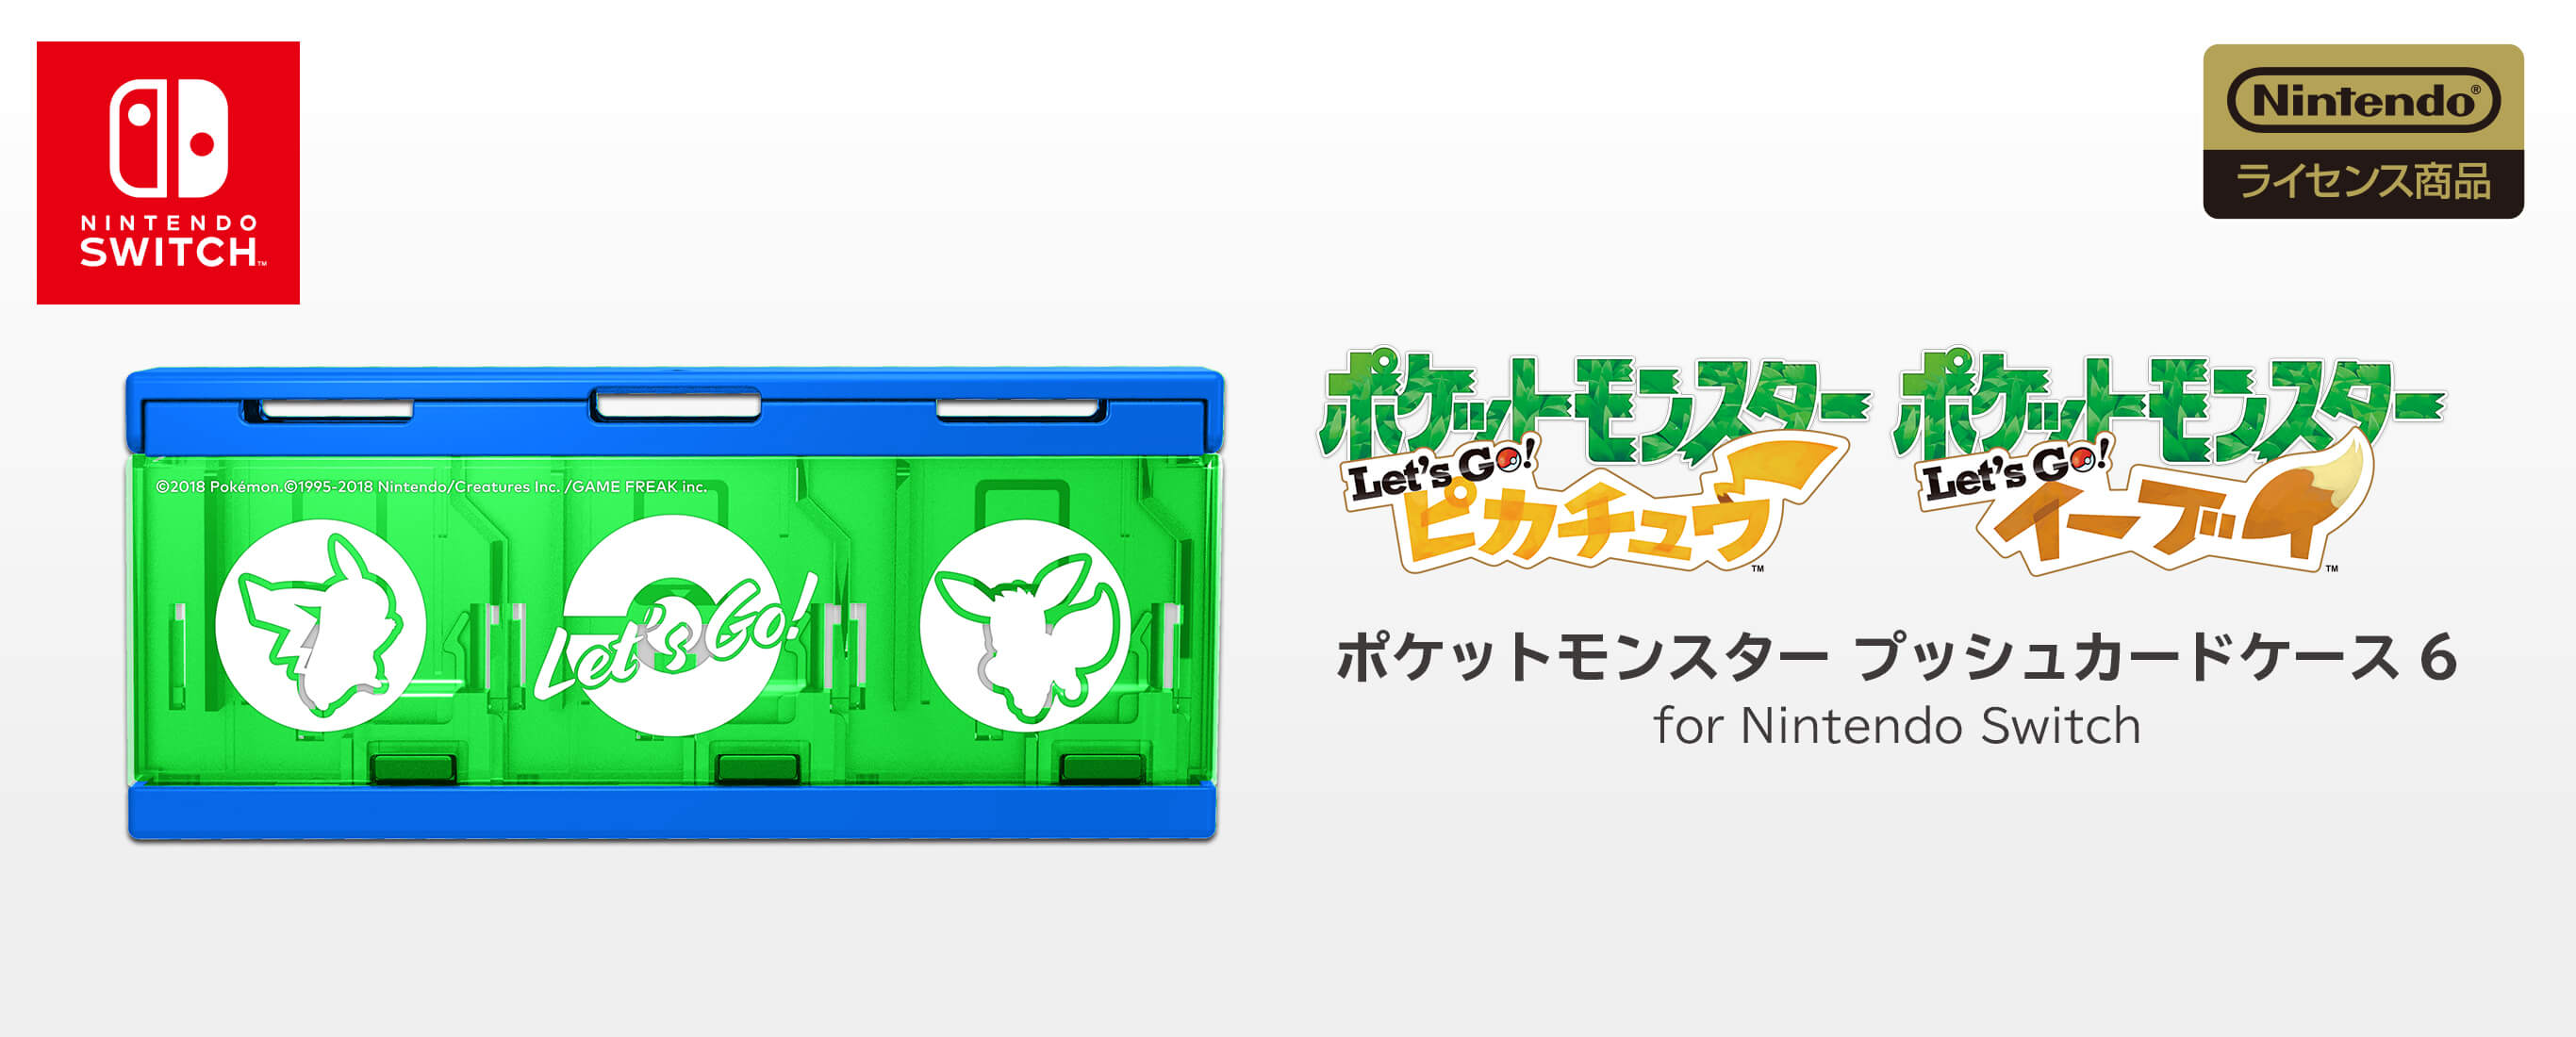 HORI, 精靈寶可夢 Let's Go, Nintendo Switch, GSE,